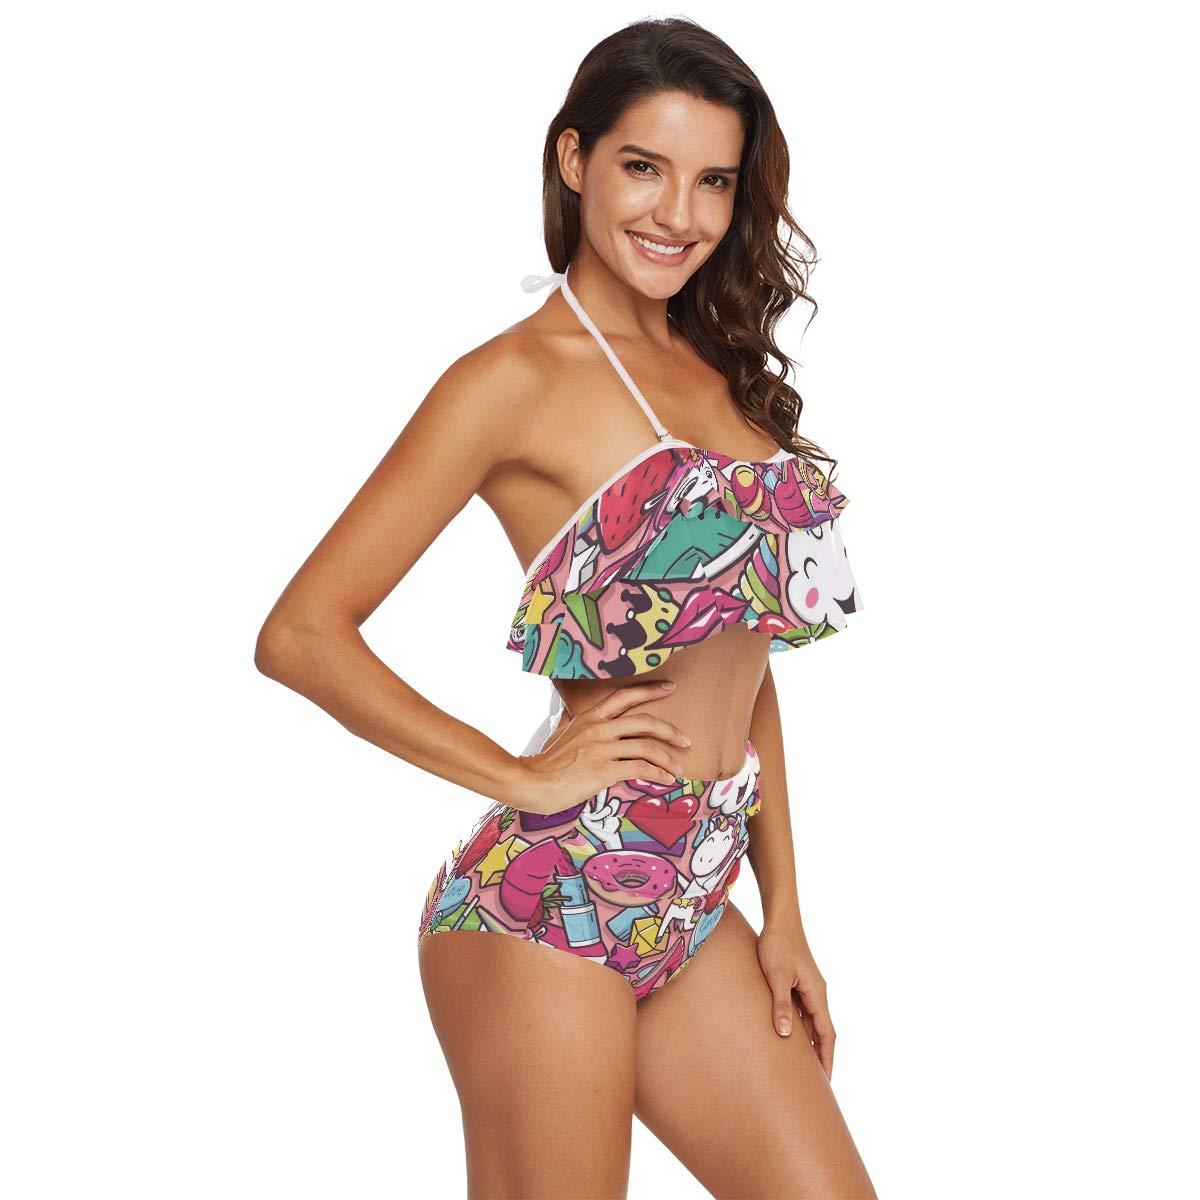 ZOEO Lemon Swimsuits Yellow Lime Tree Tropical Bikini Set Swimwear Top Bottom Bathing Suit for Girl Women